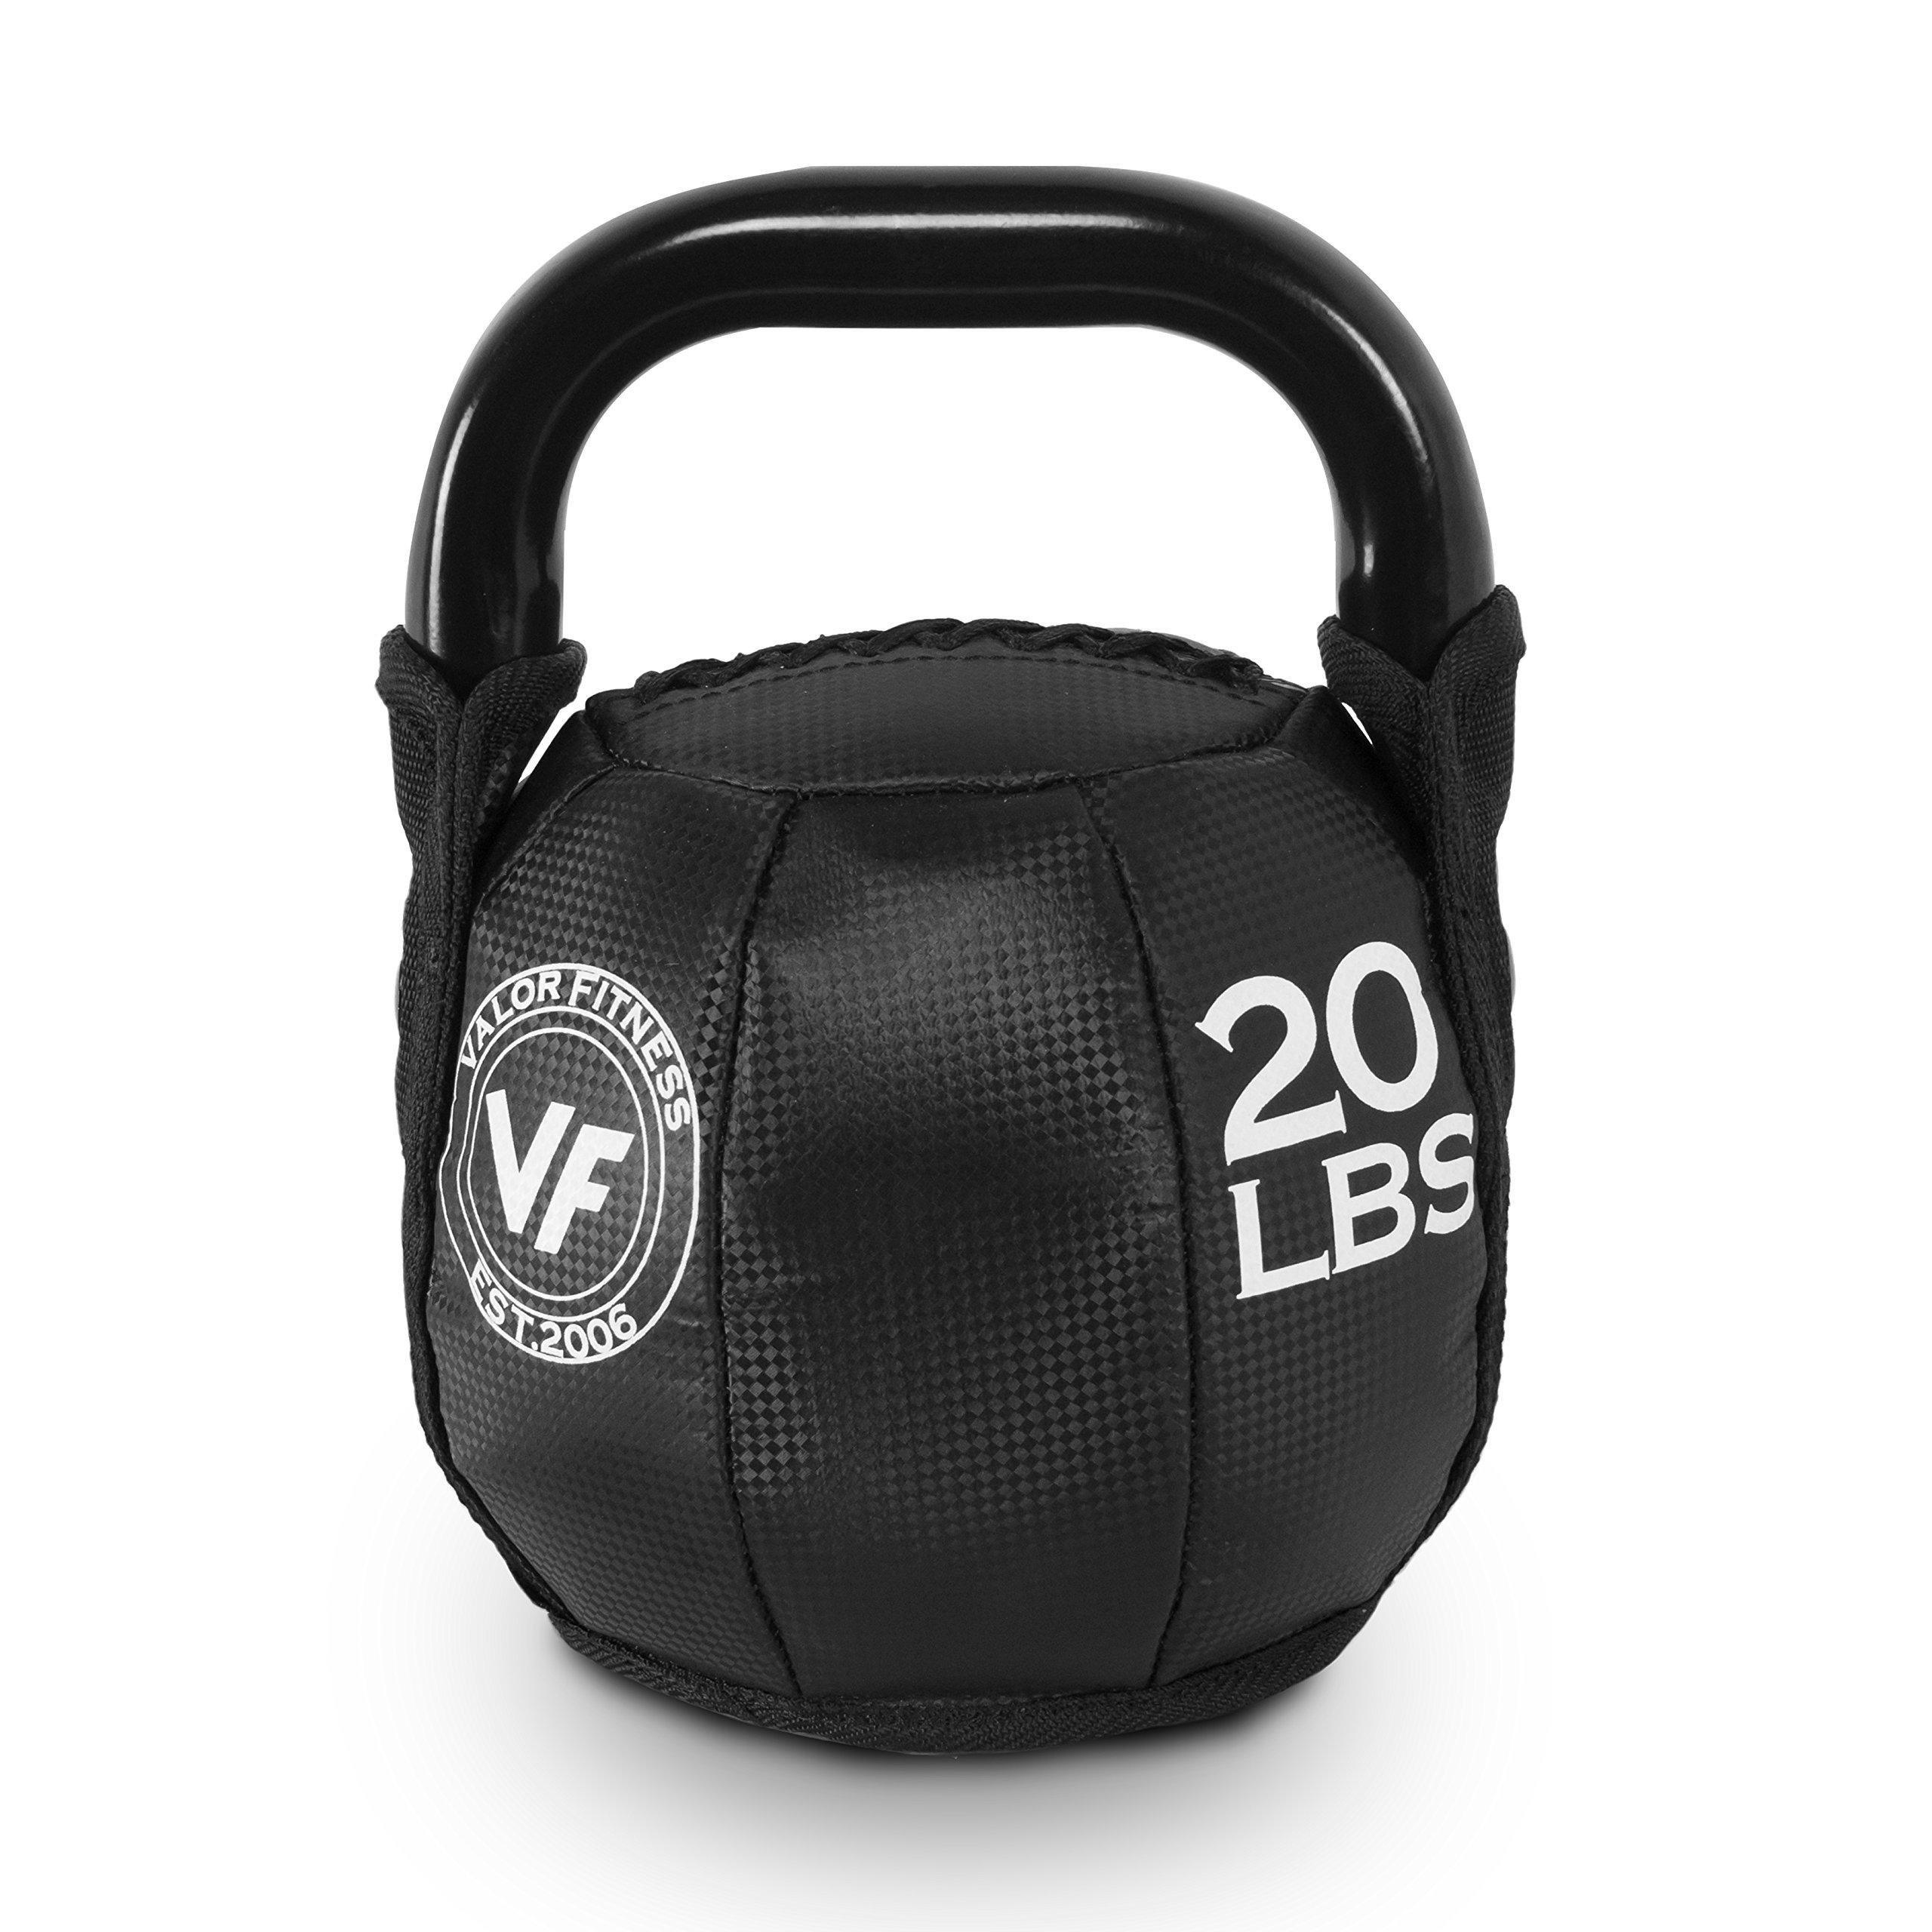 Valor Fitness SKB Soft Kettlebells - 10, 15, 20, 25, 30, 35 lb. Options